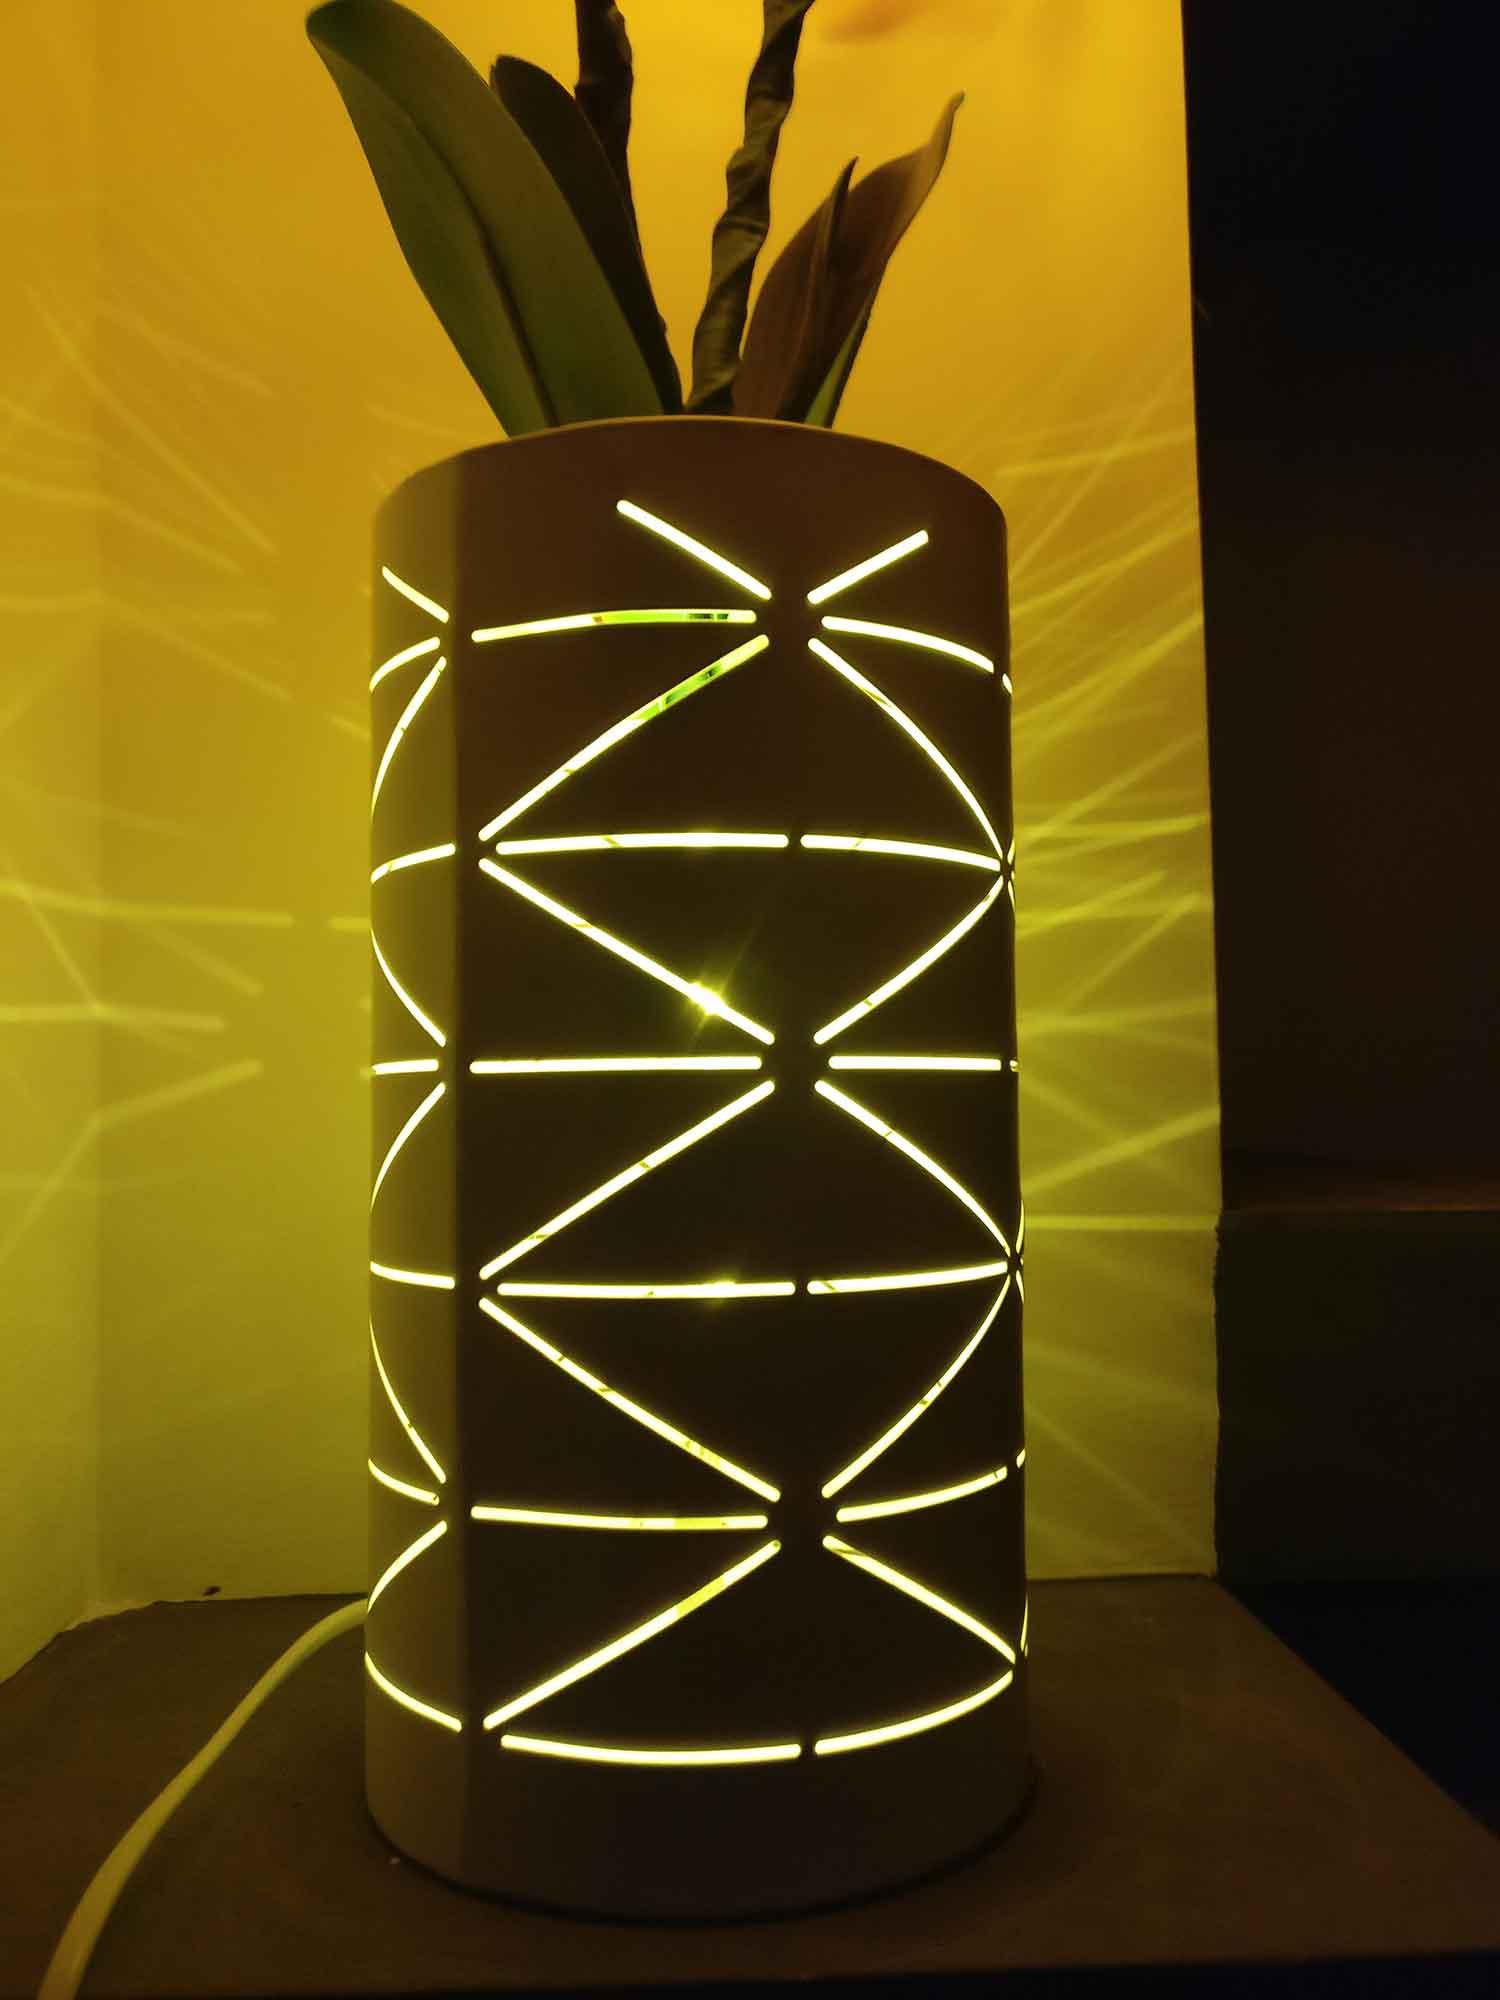 Kons-, Led Cymbidium Lamp 4w 50hz Warranty 3 Years-7